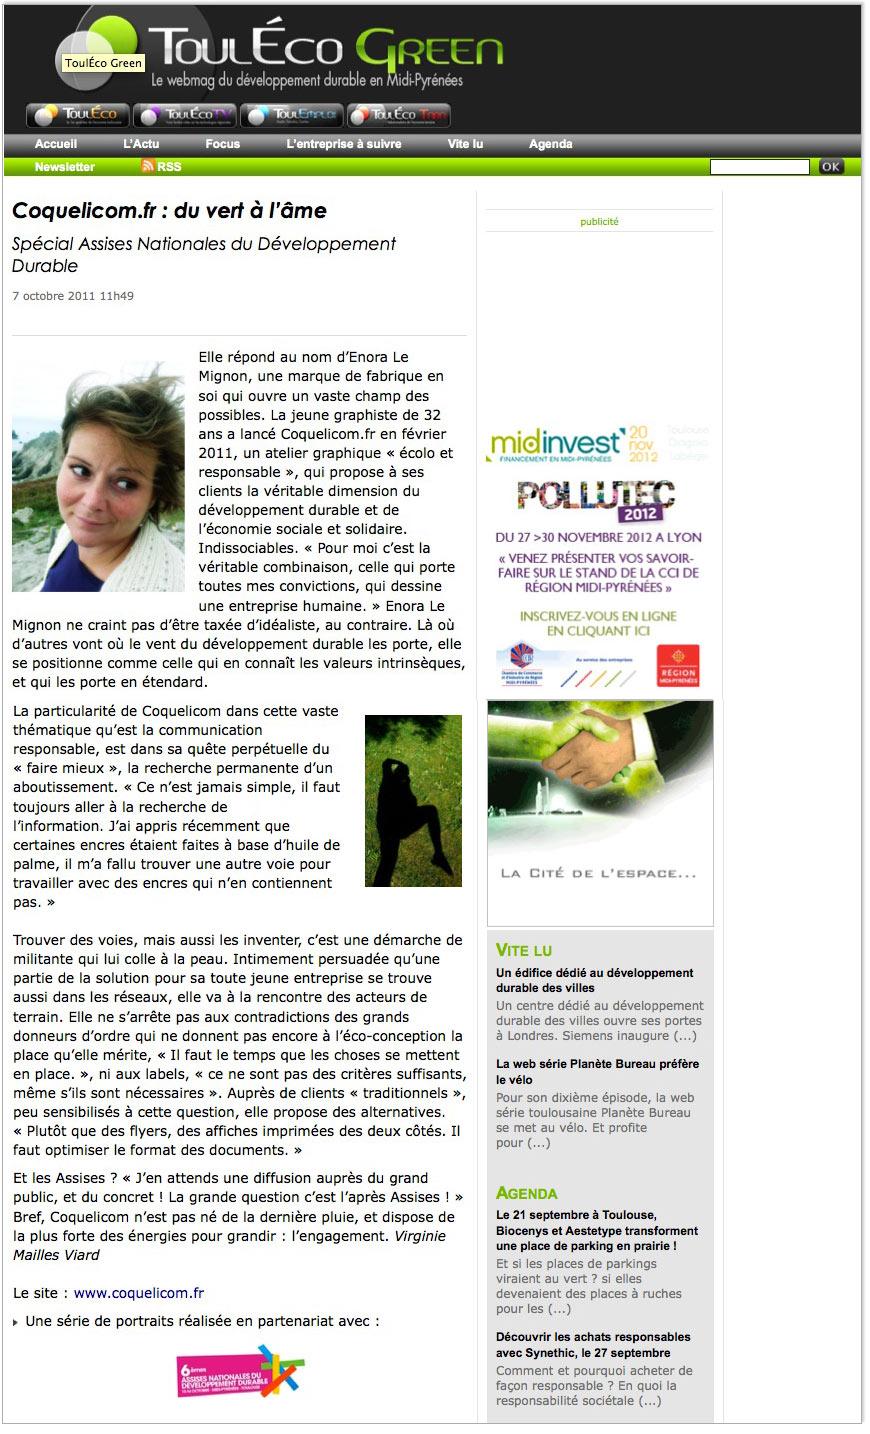 http://www.touleco-greenbusiness.fr/actu/l-actu/article/coquelicom-fr-du-vert-a-l-ame